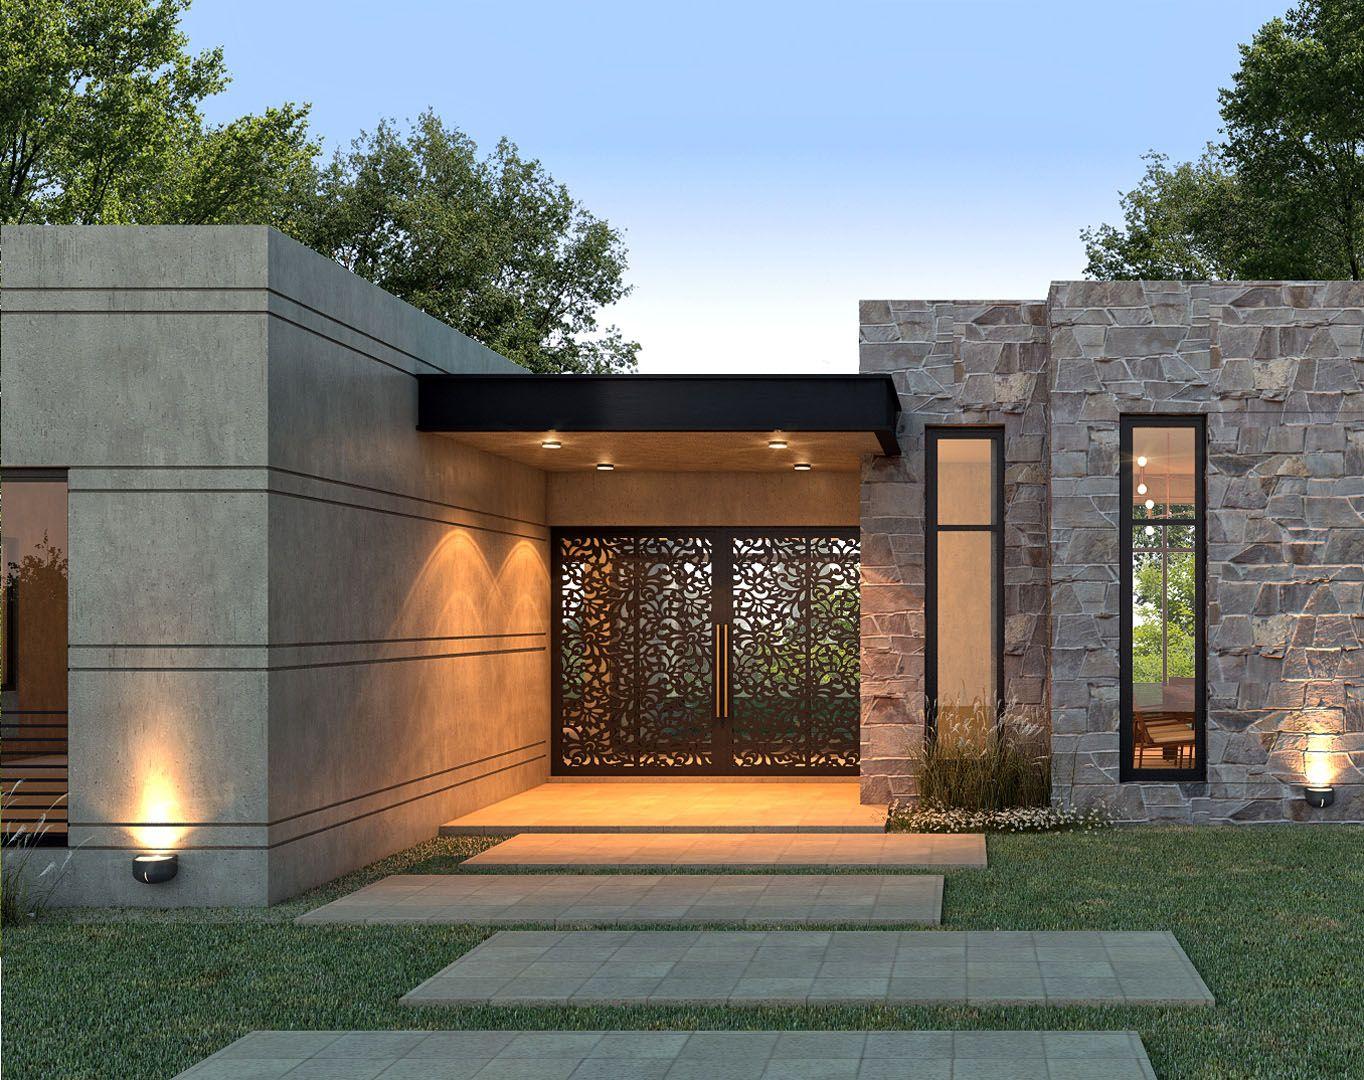 Ingresso Casa Esterno In Pietra nf arquitecta, casa la macarena | design esterno di casa